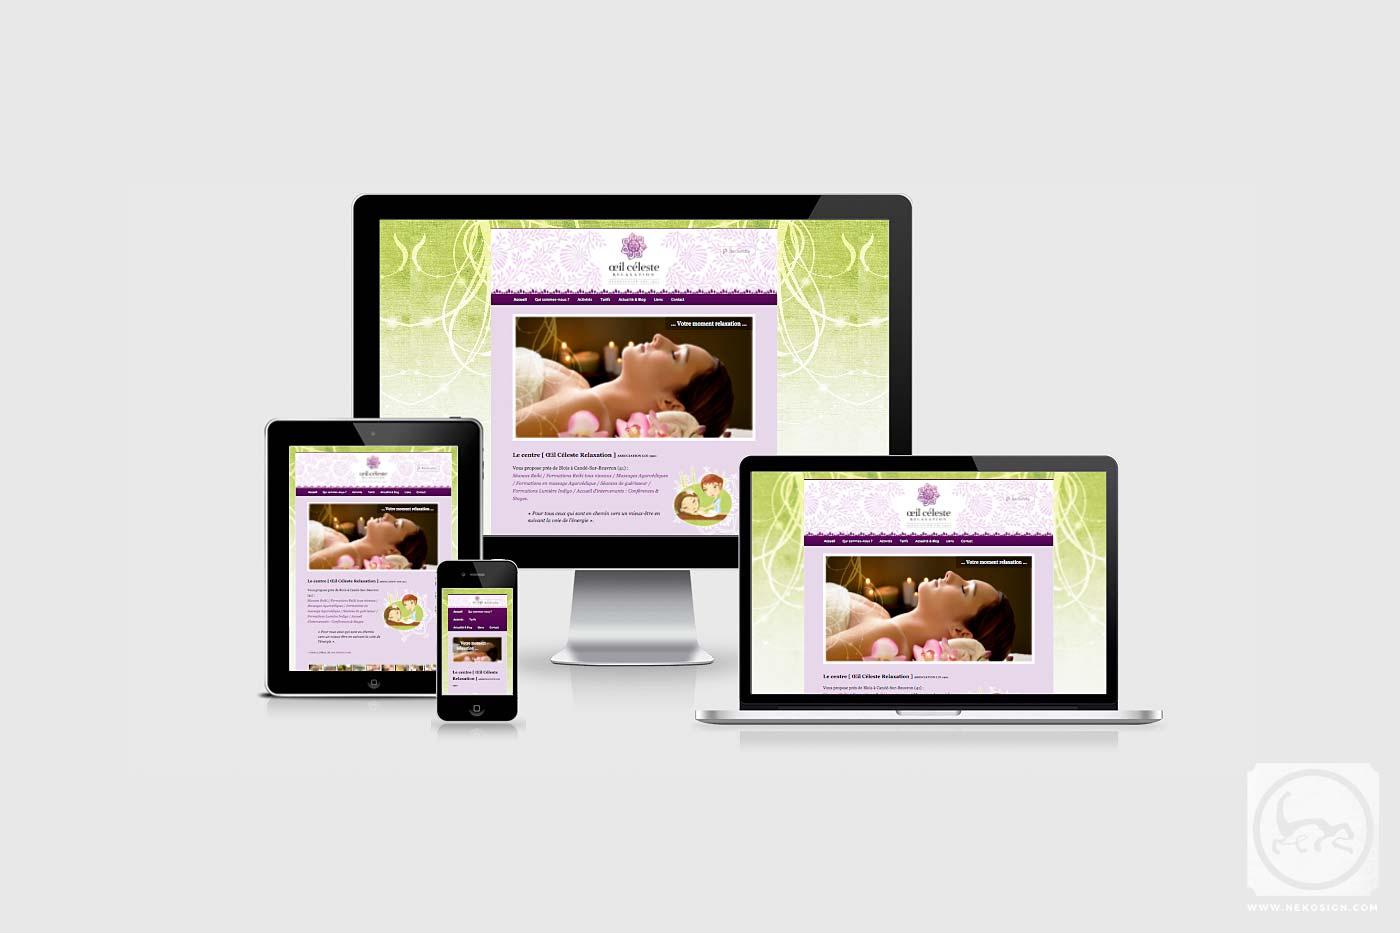 Webdesign Responsive Nekosign - Œil Céleste Relaxation